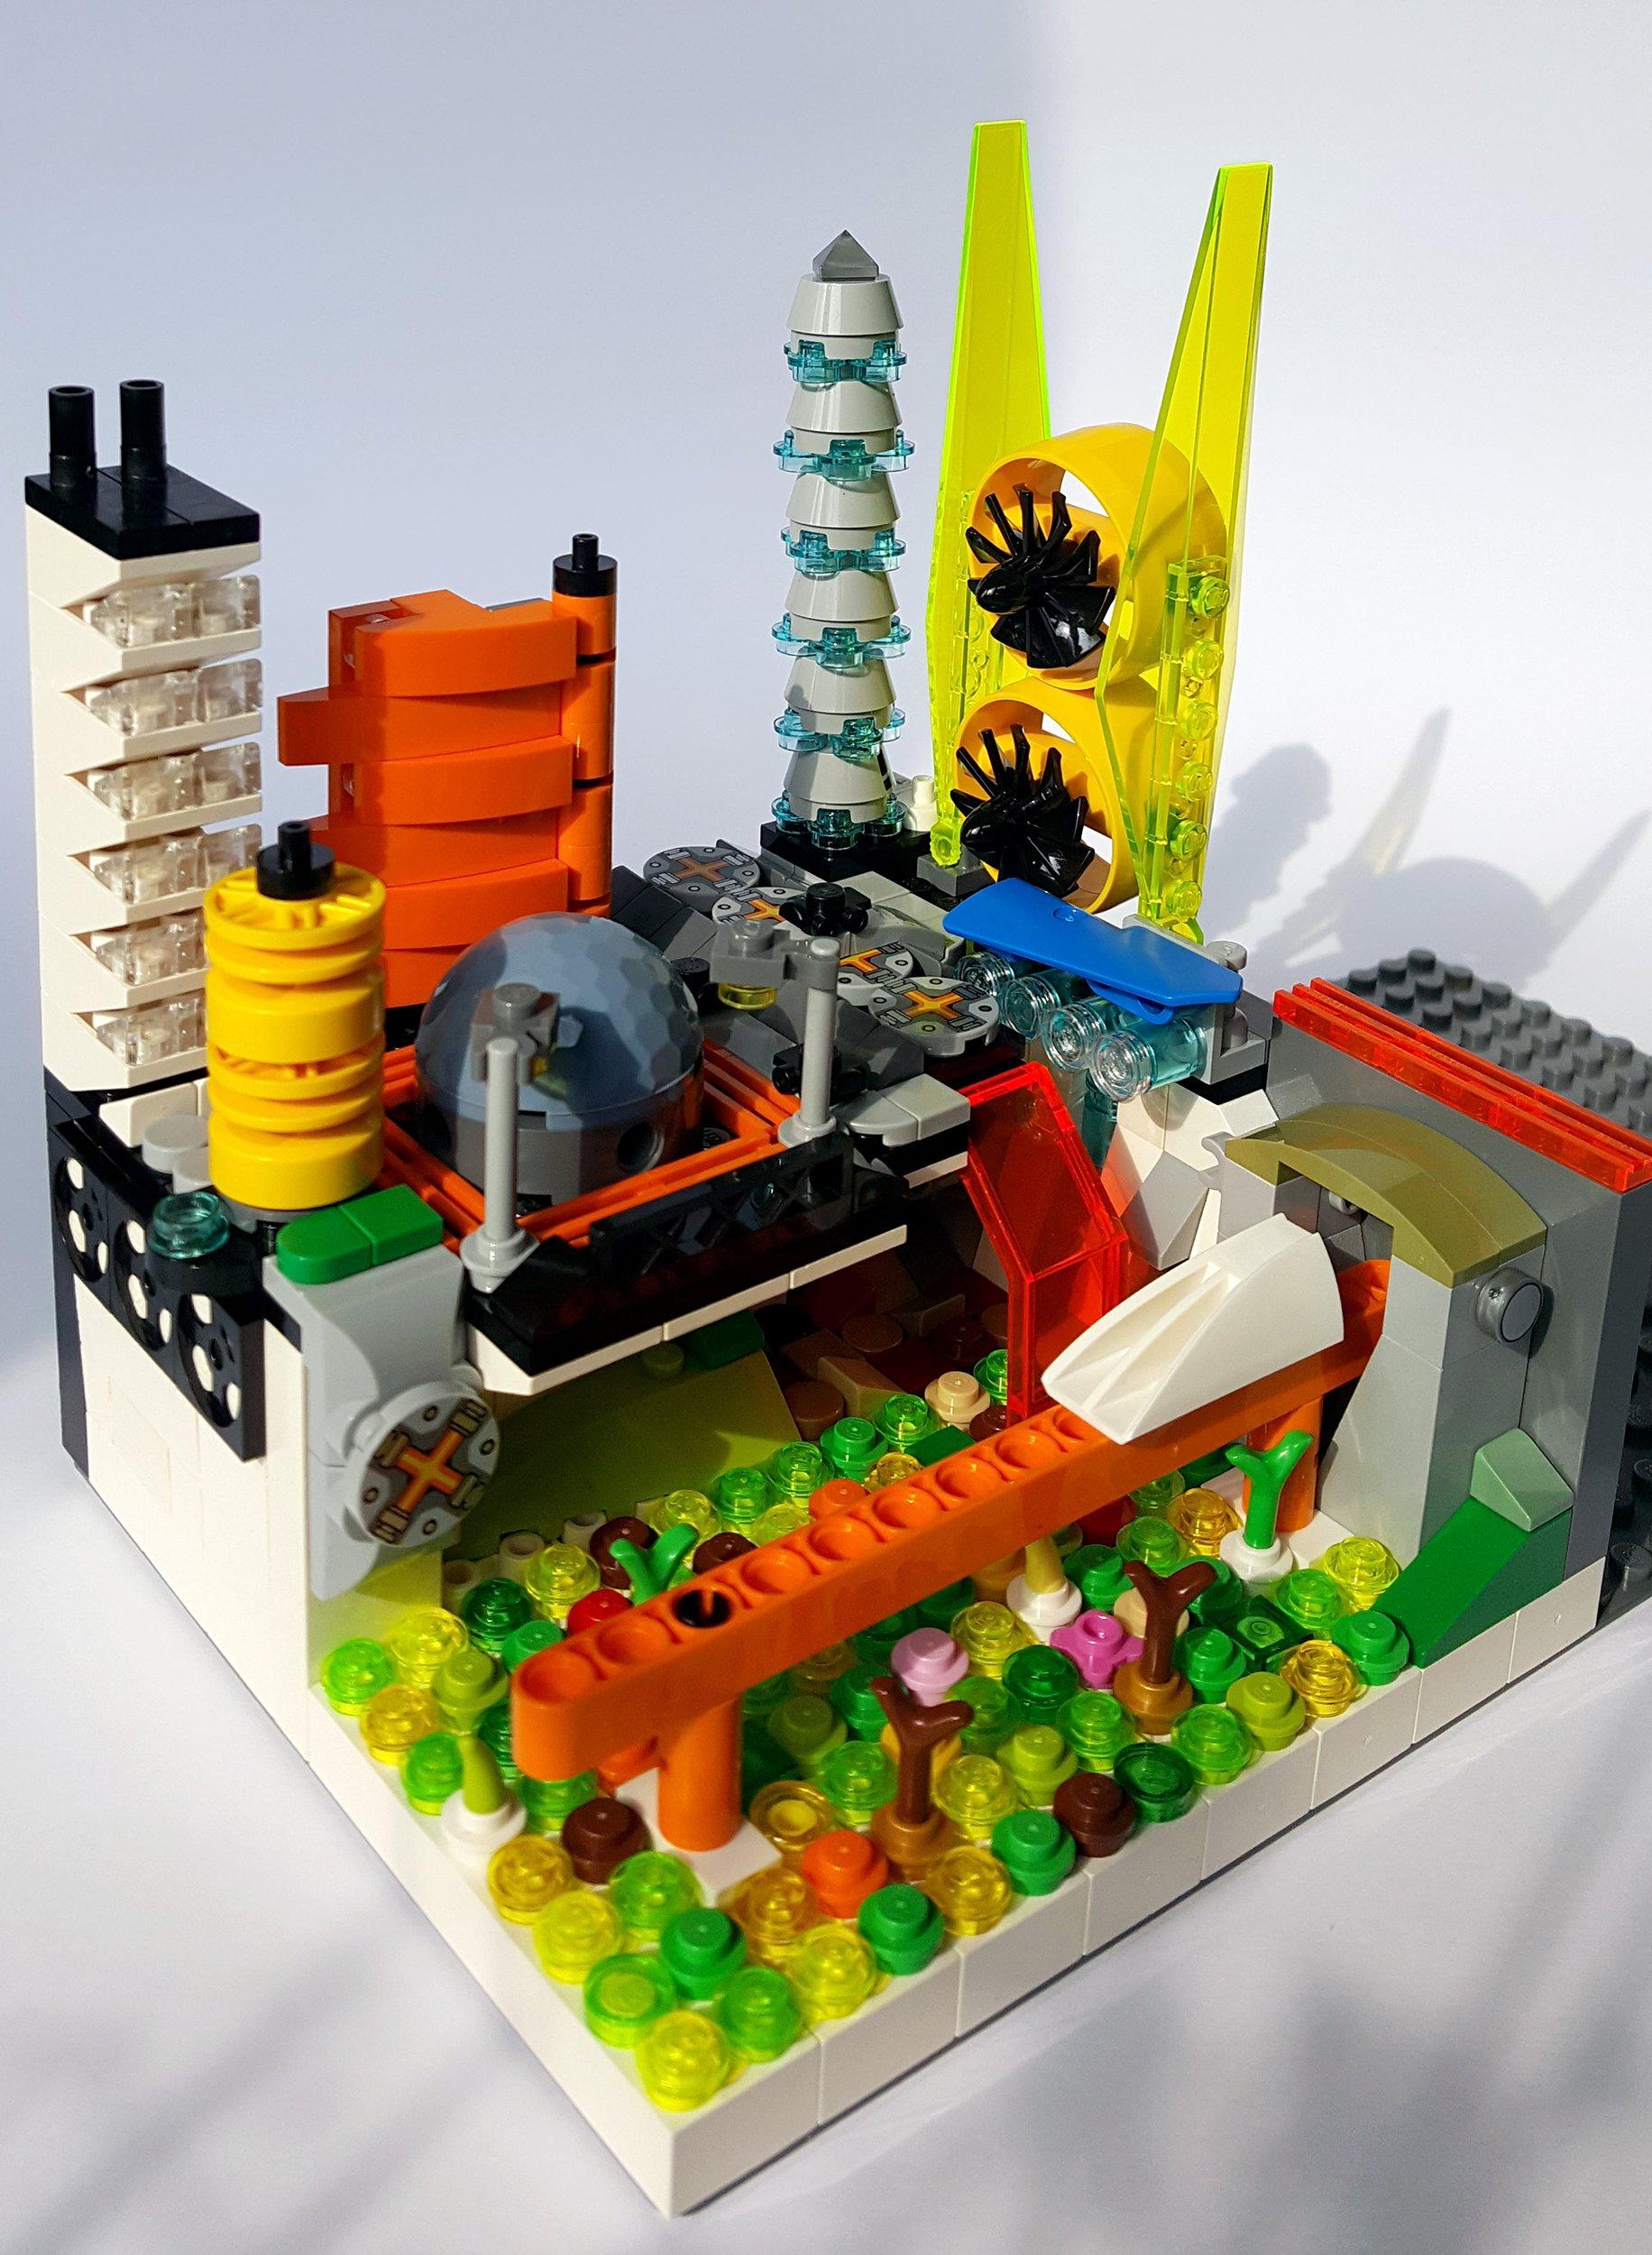 Concurs Microscale Future City – Creatia 5: Dystopian City